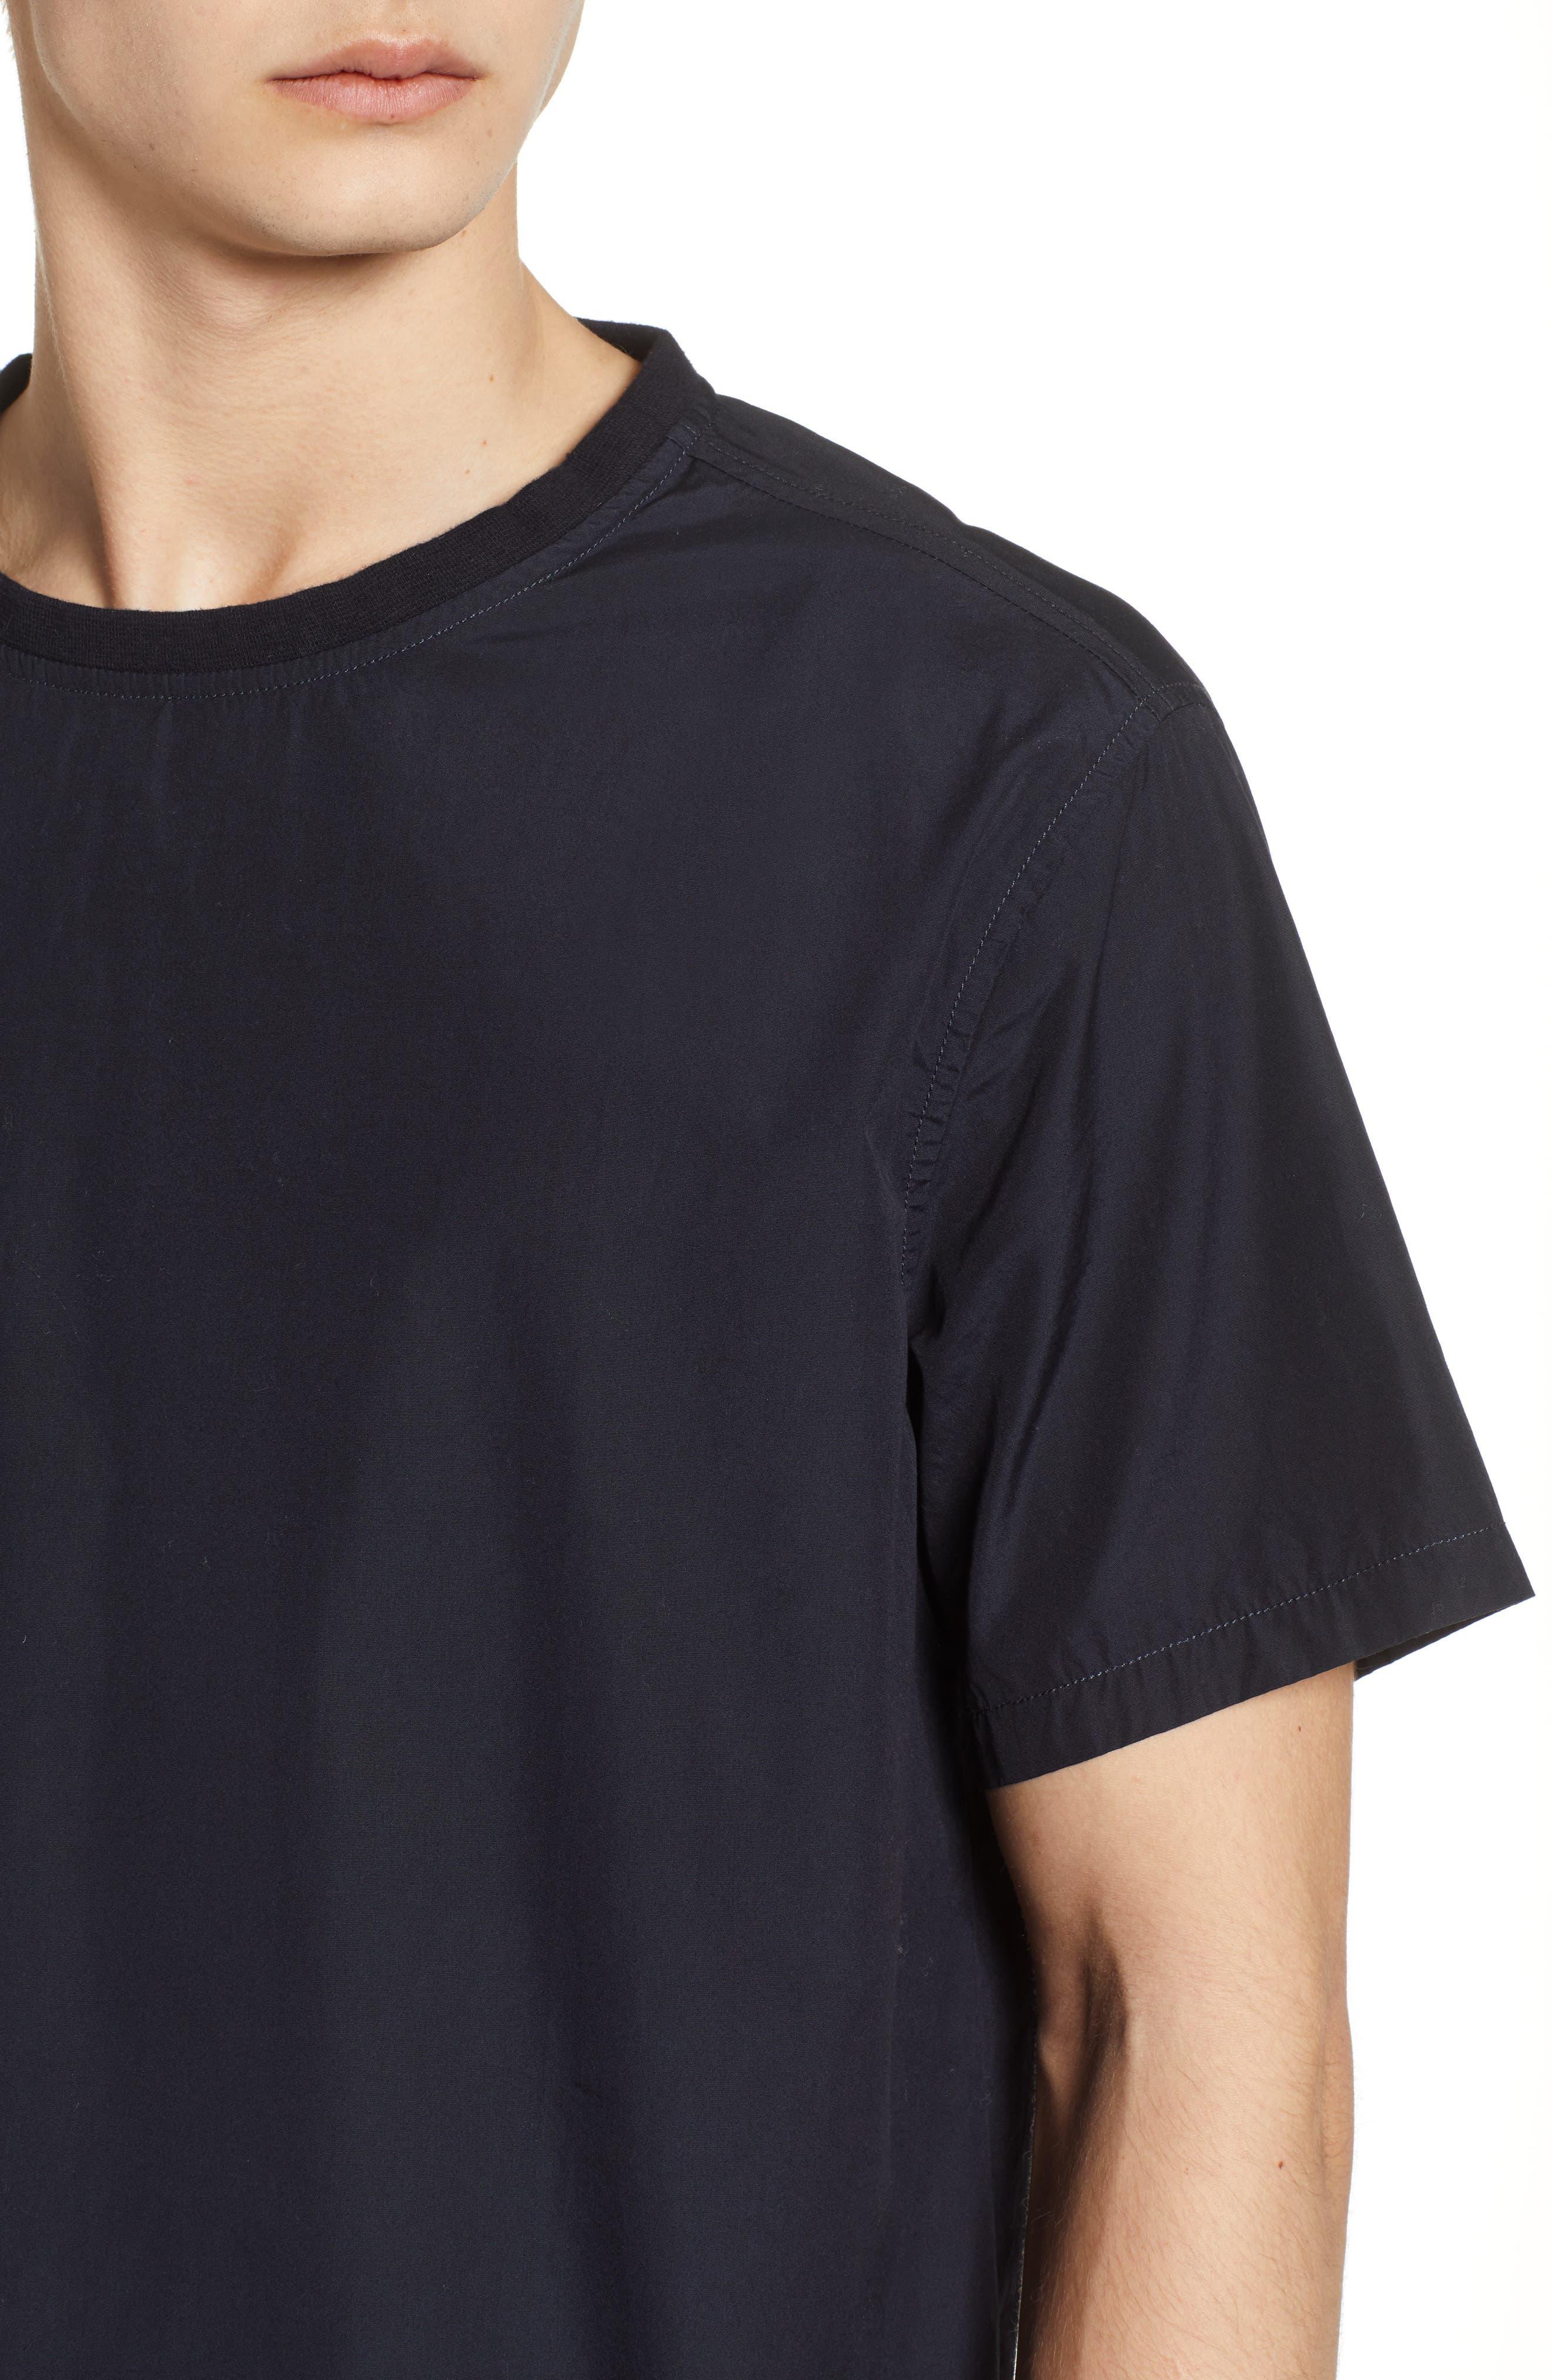 Woven T-Shirt,                             Alternate thumbnail 4, color,                             001